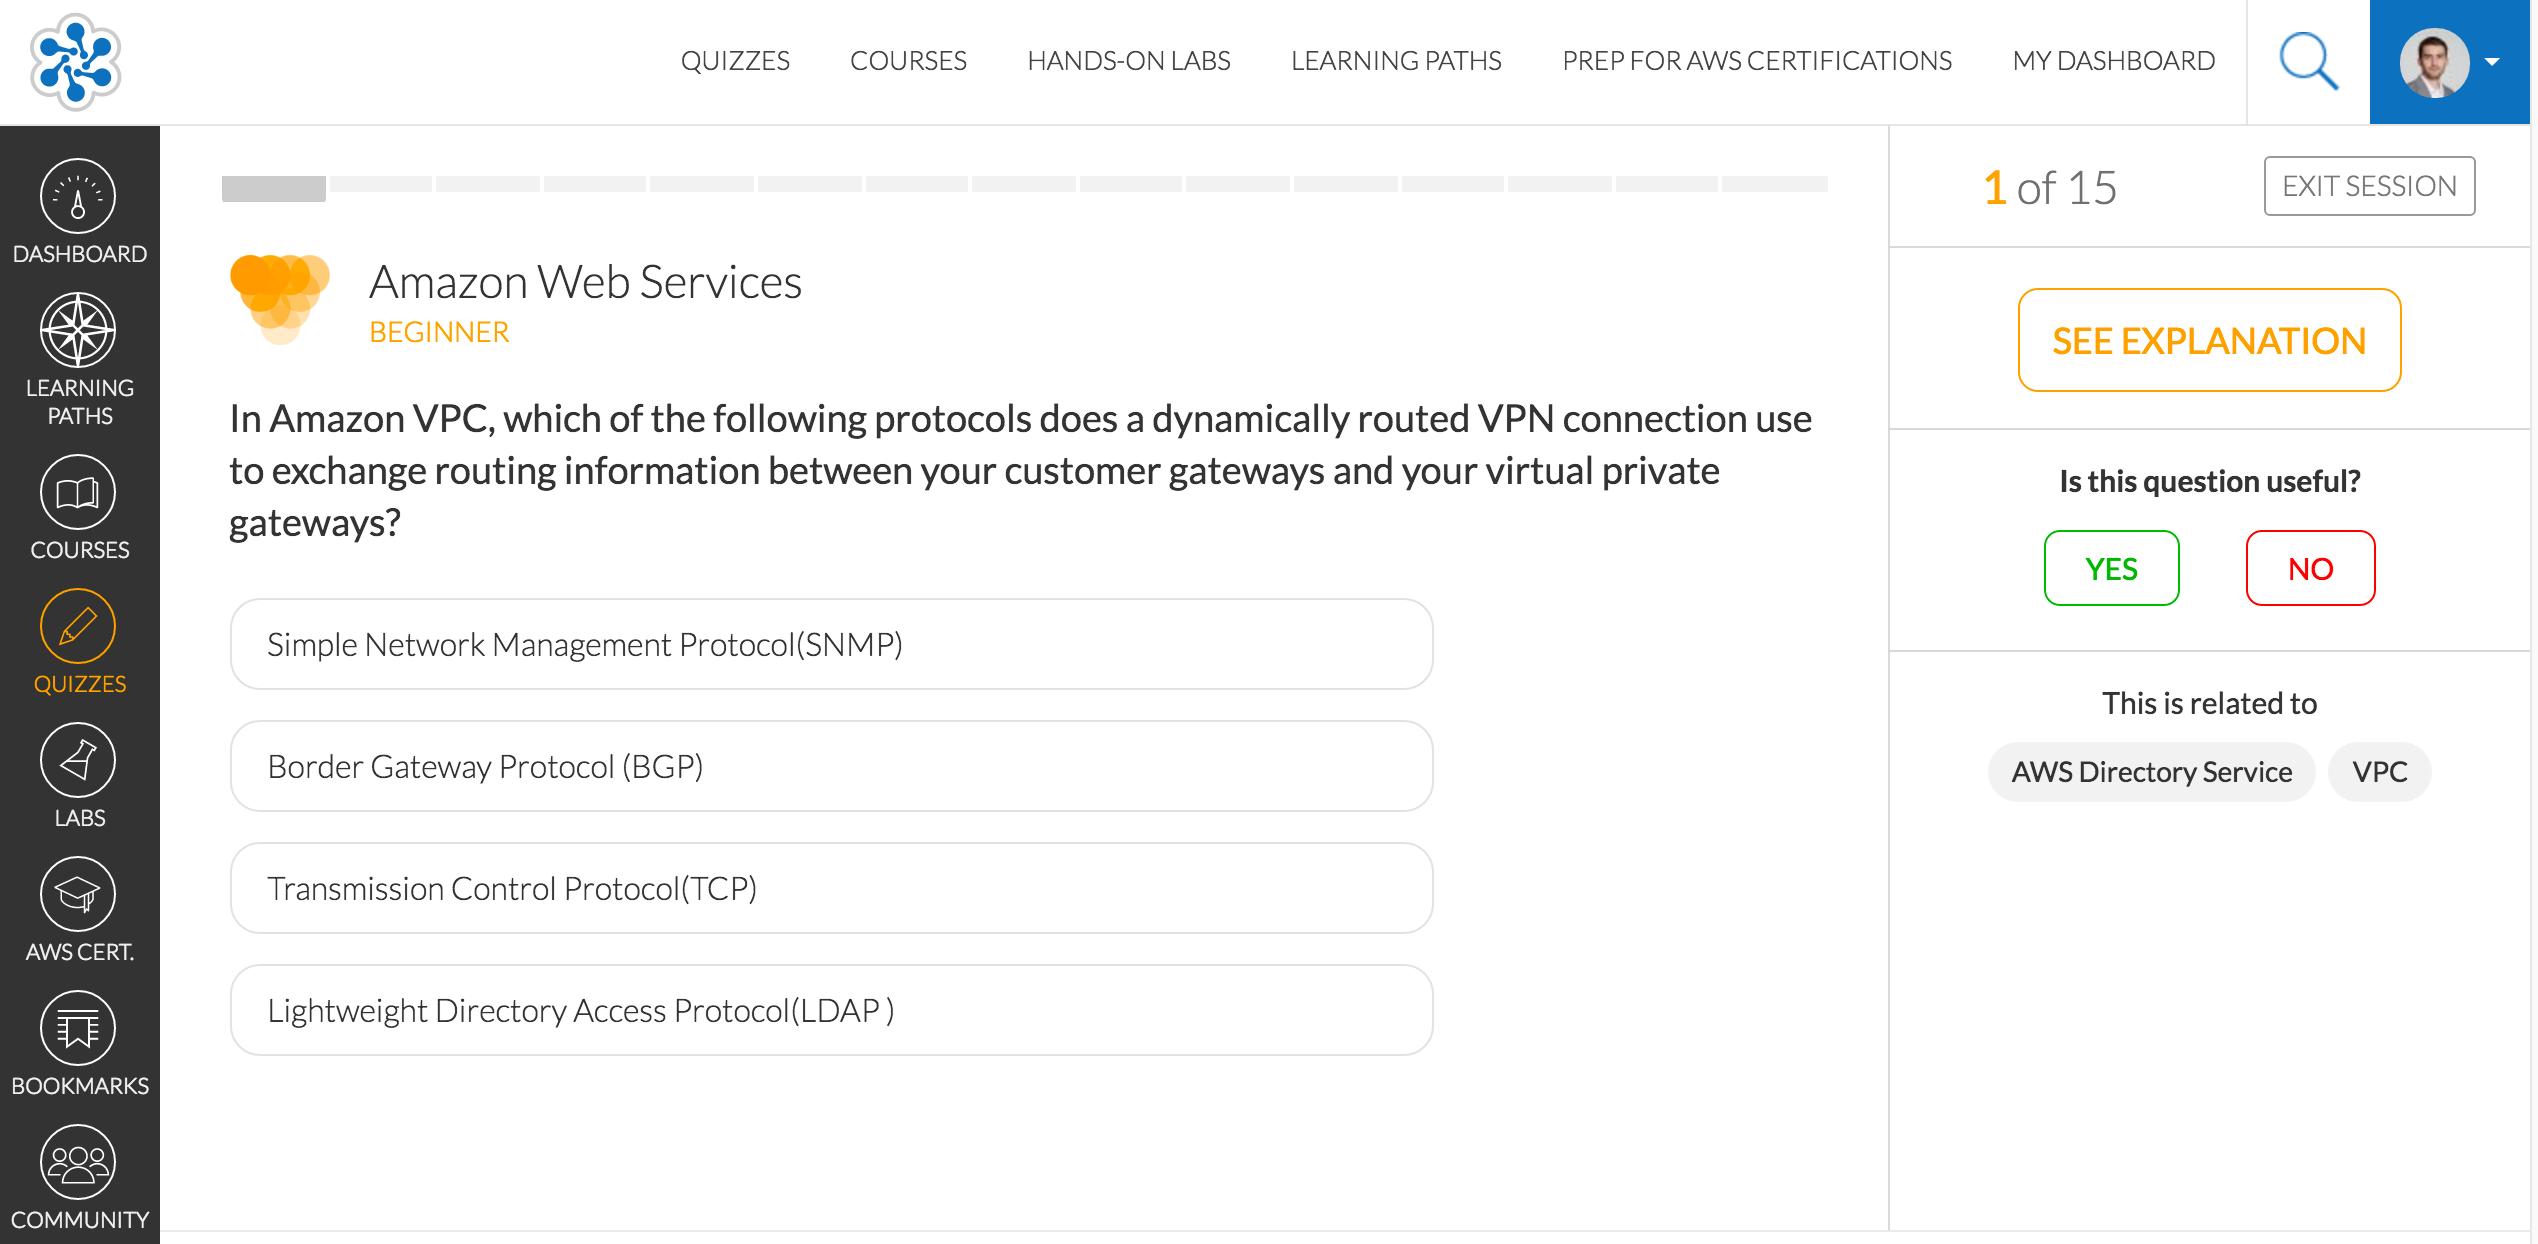 Cloud Academy quiz screenshot